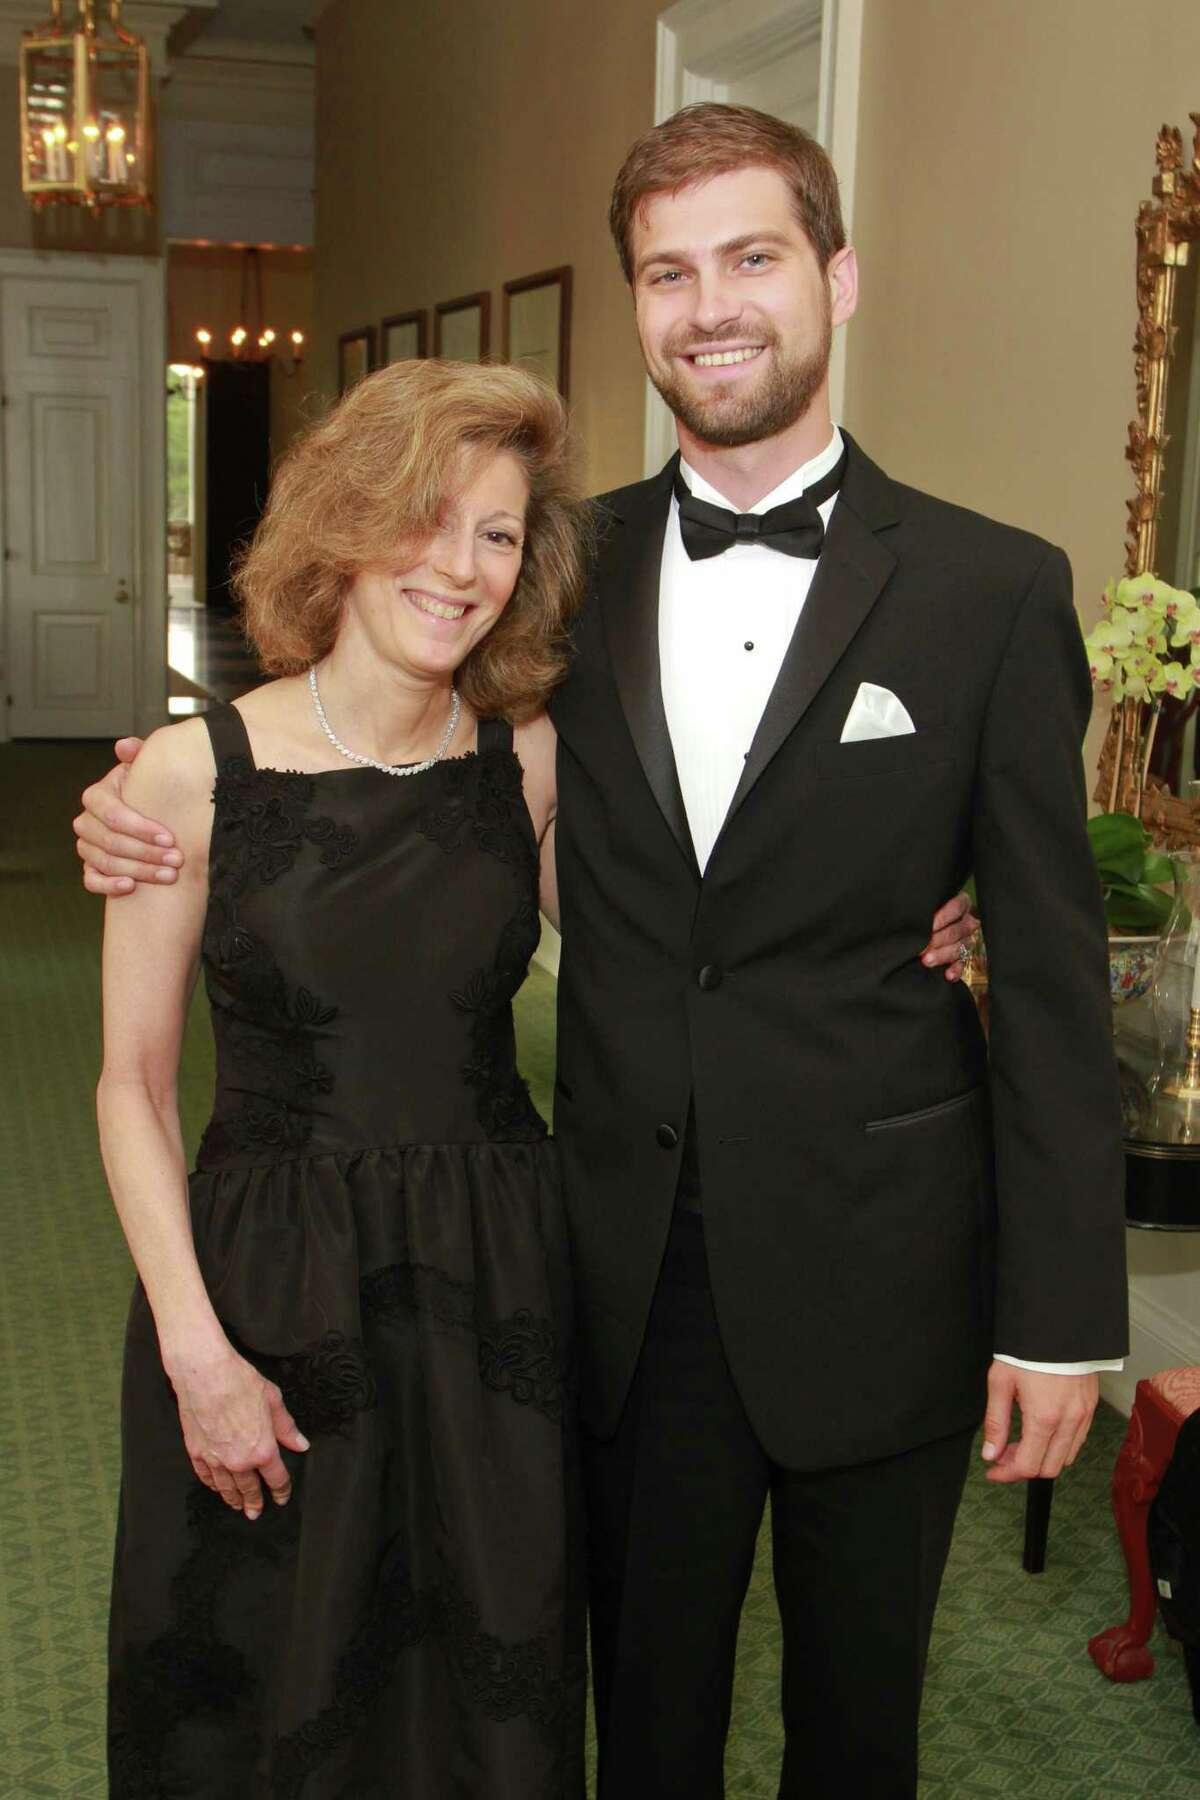 Susan and John de Menil